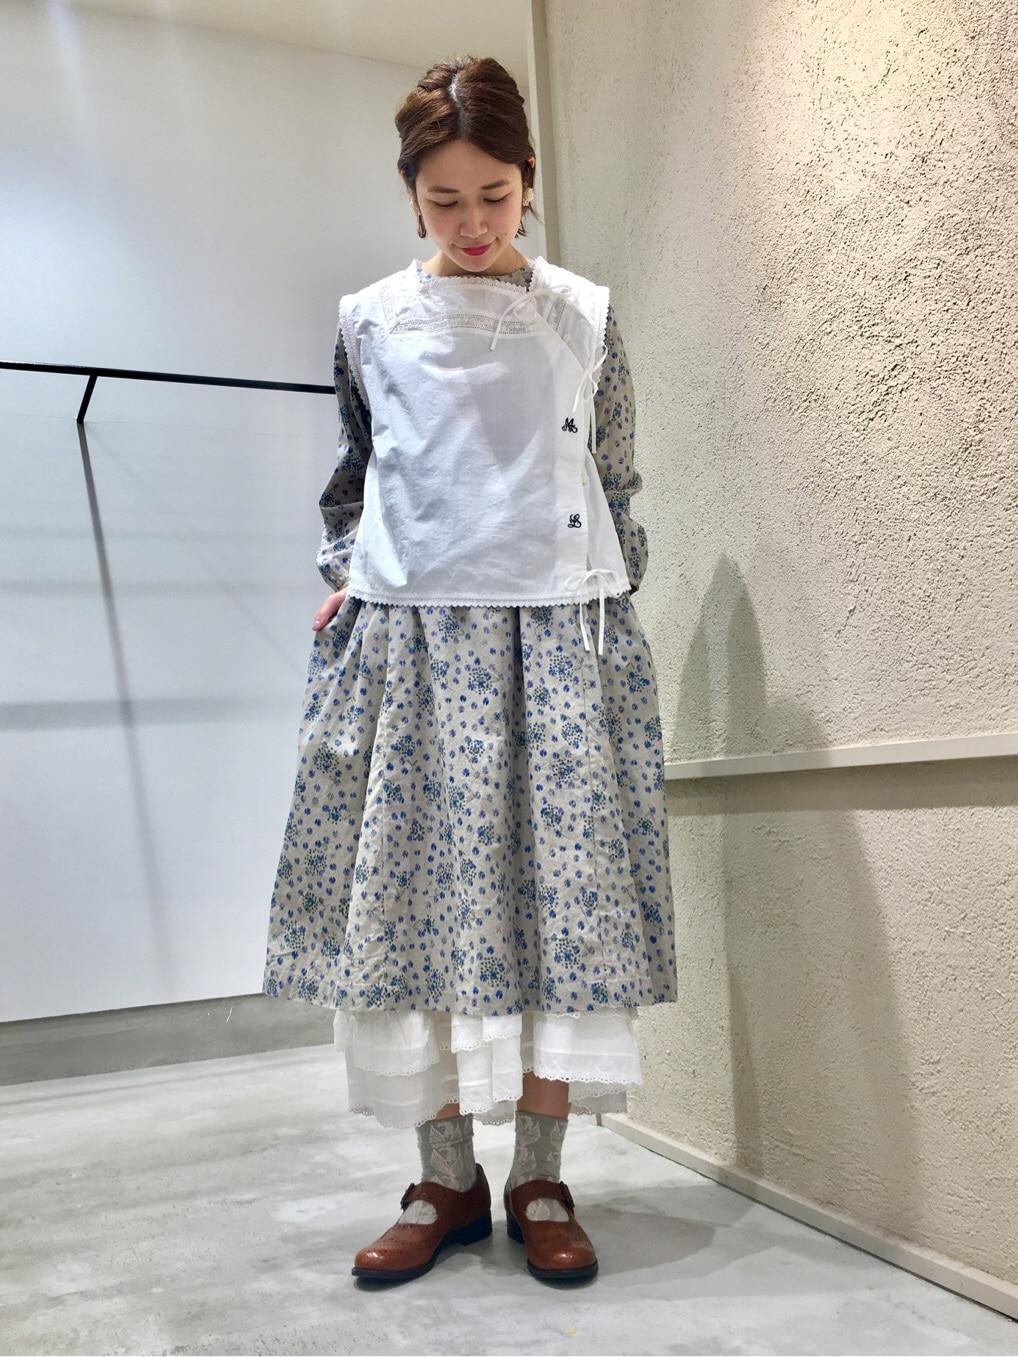 chambre de charme 横浜ジョイナス 身長:160cm 2020.12.24